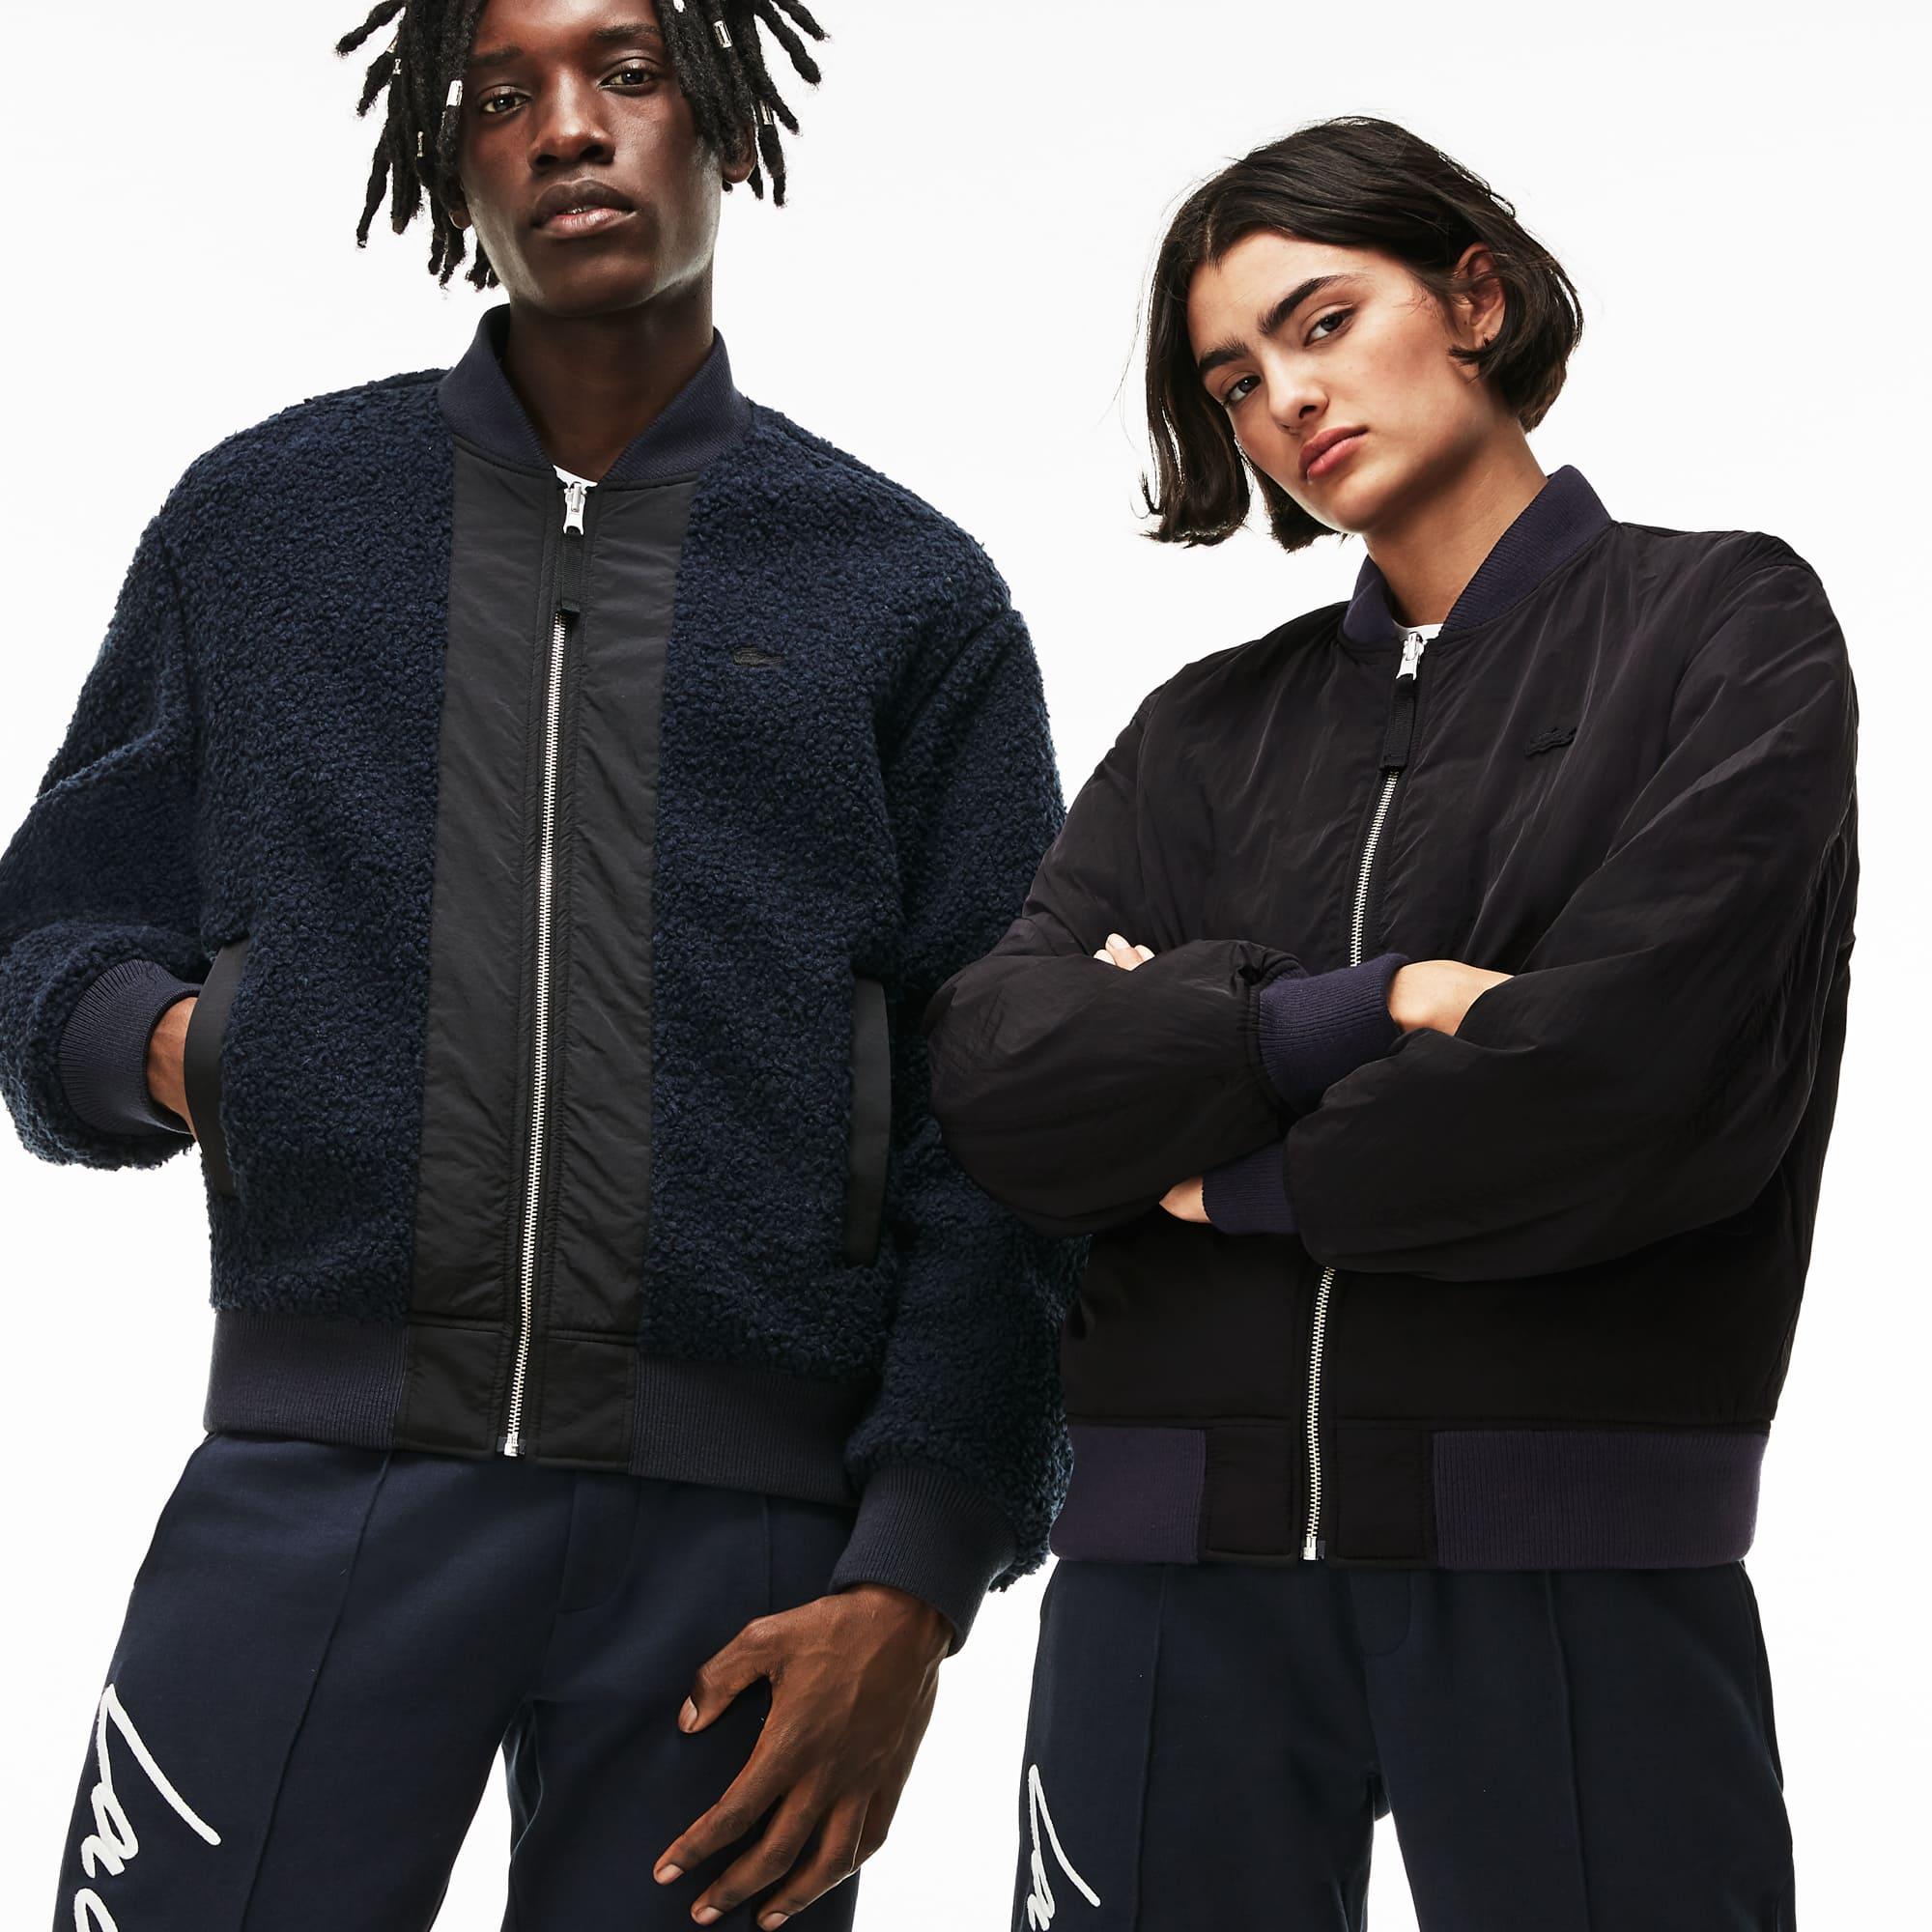 09b4feccf473ed Men s Jackets and Coats on Sale